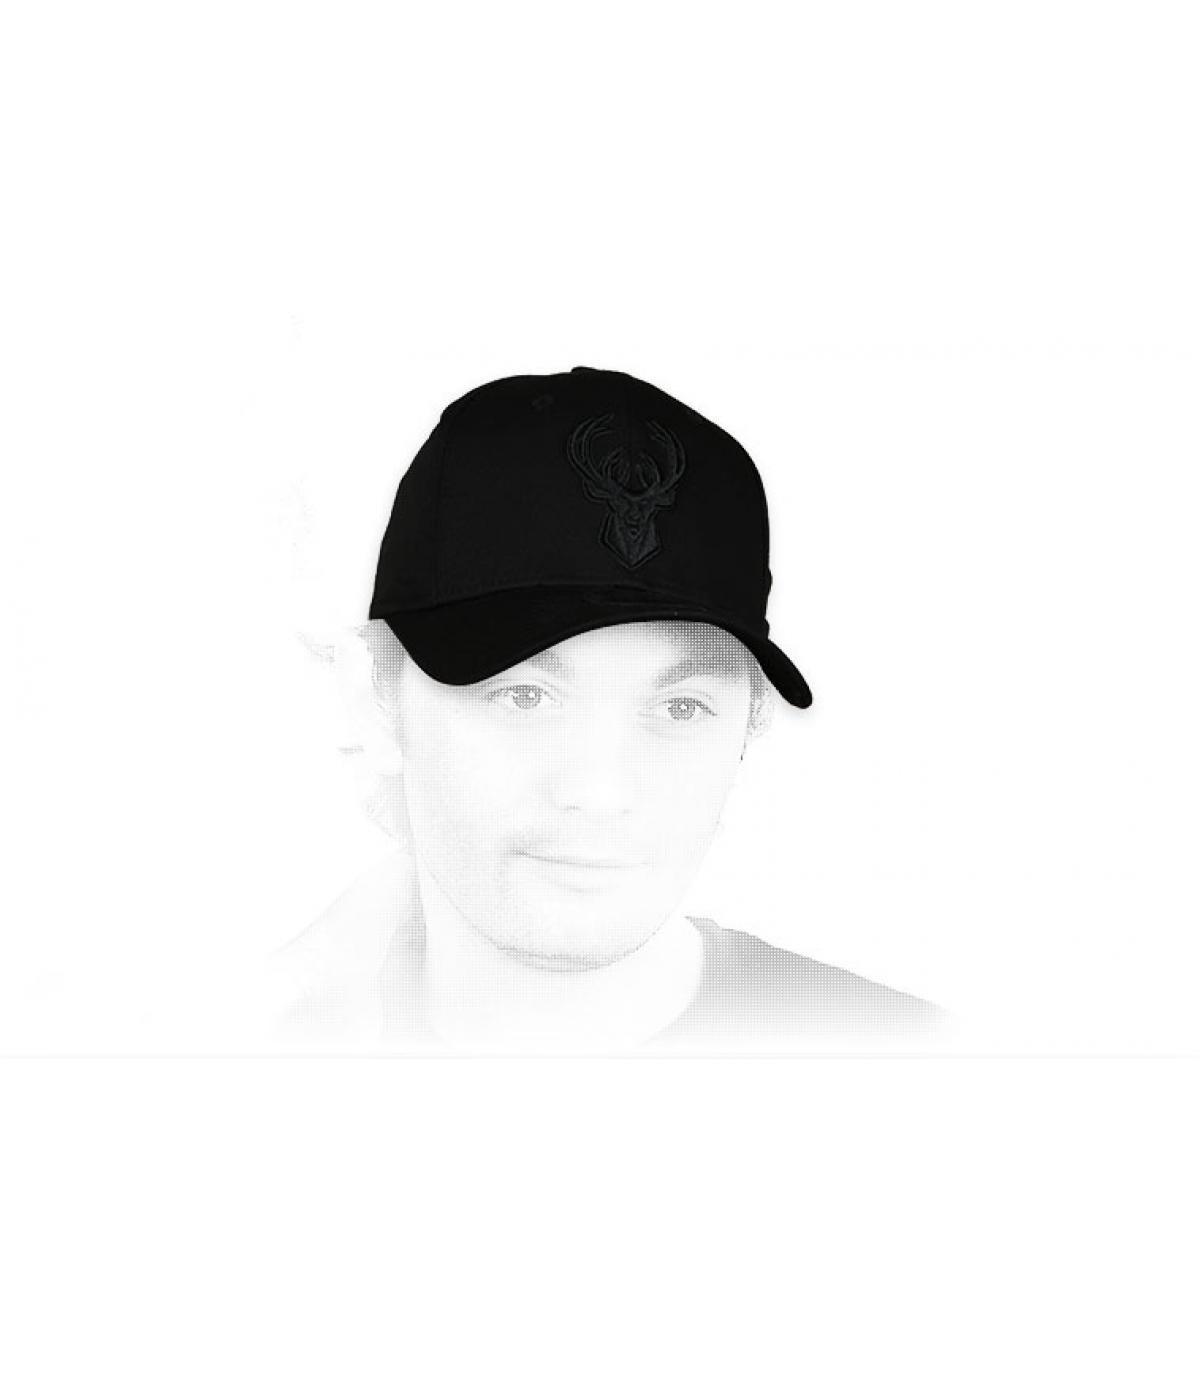 black Bucks cap